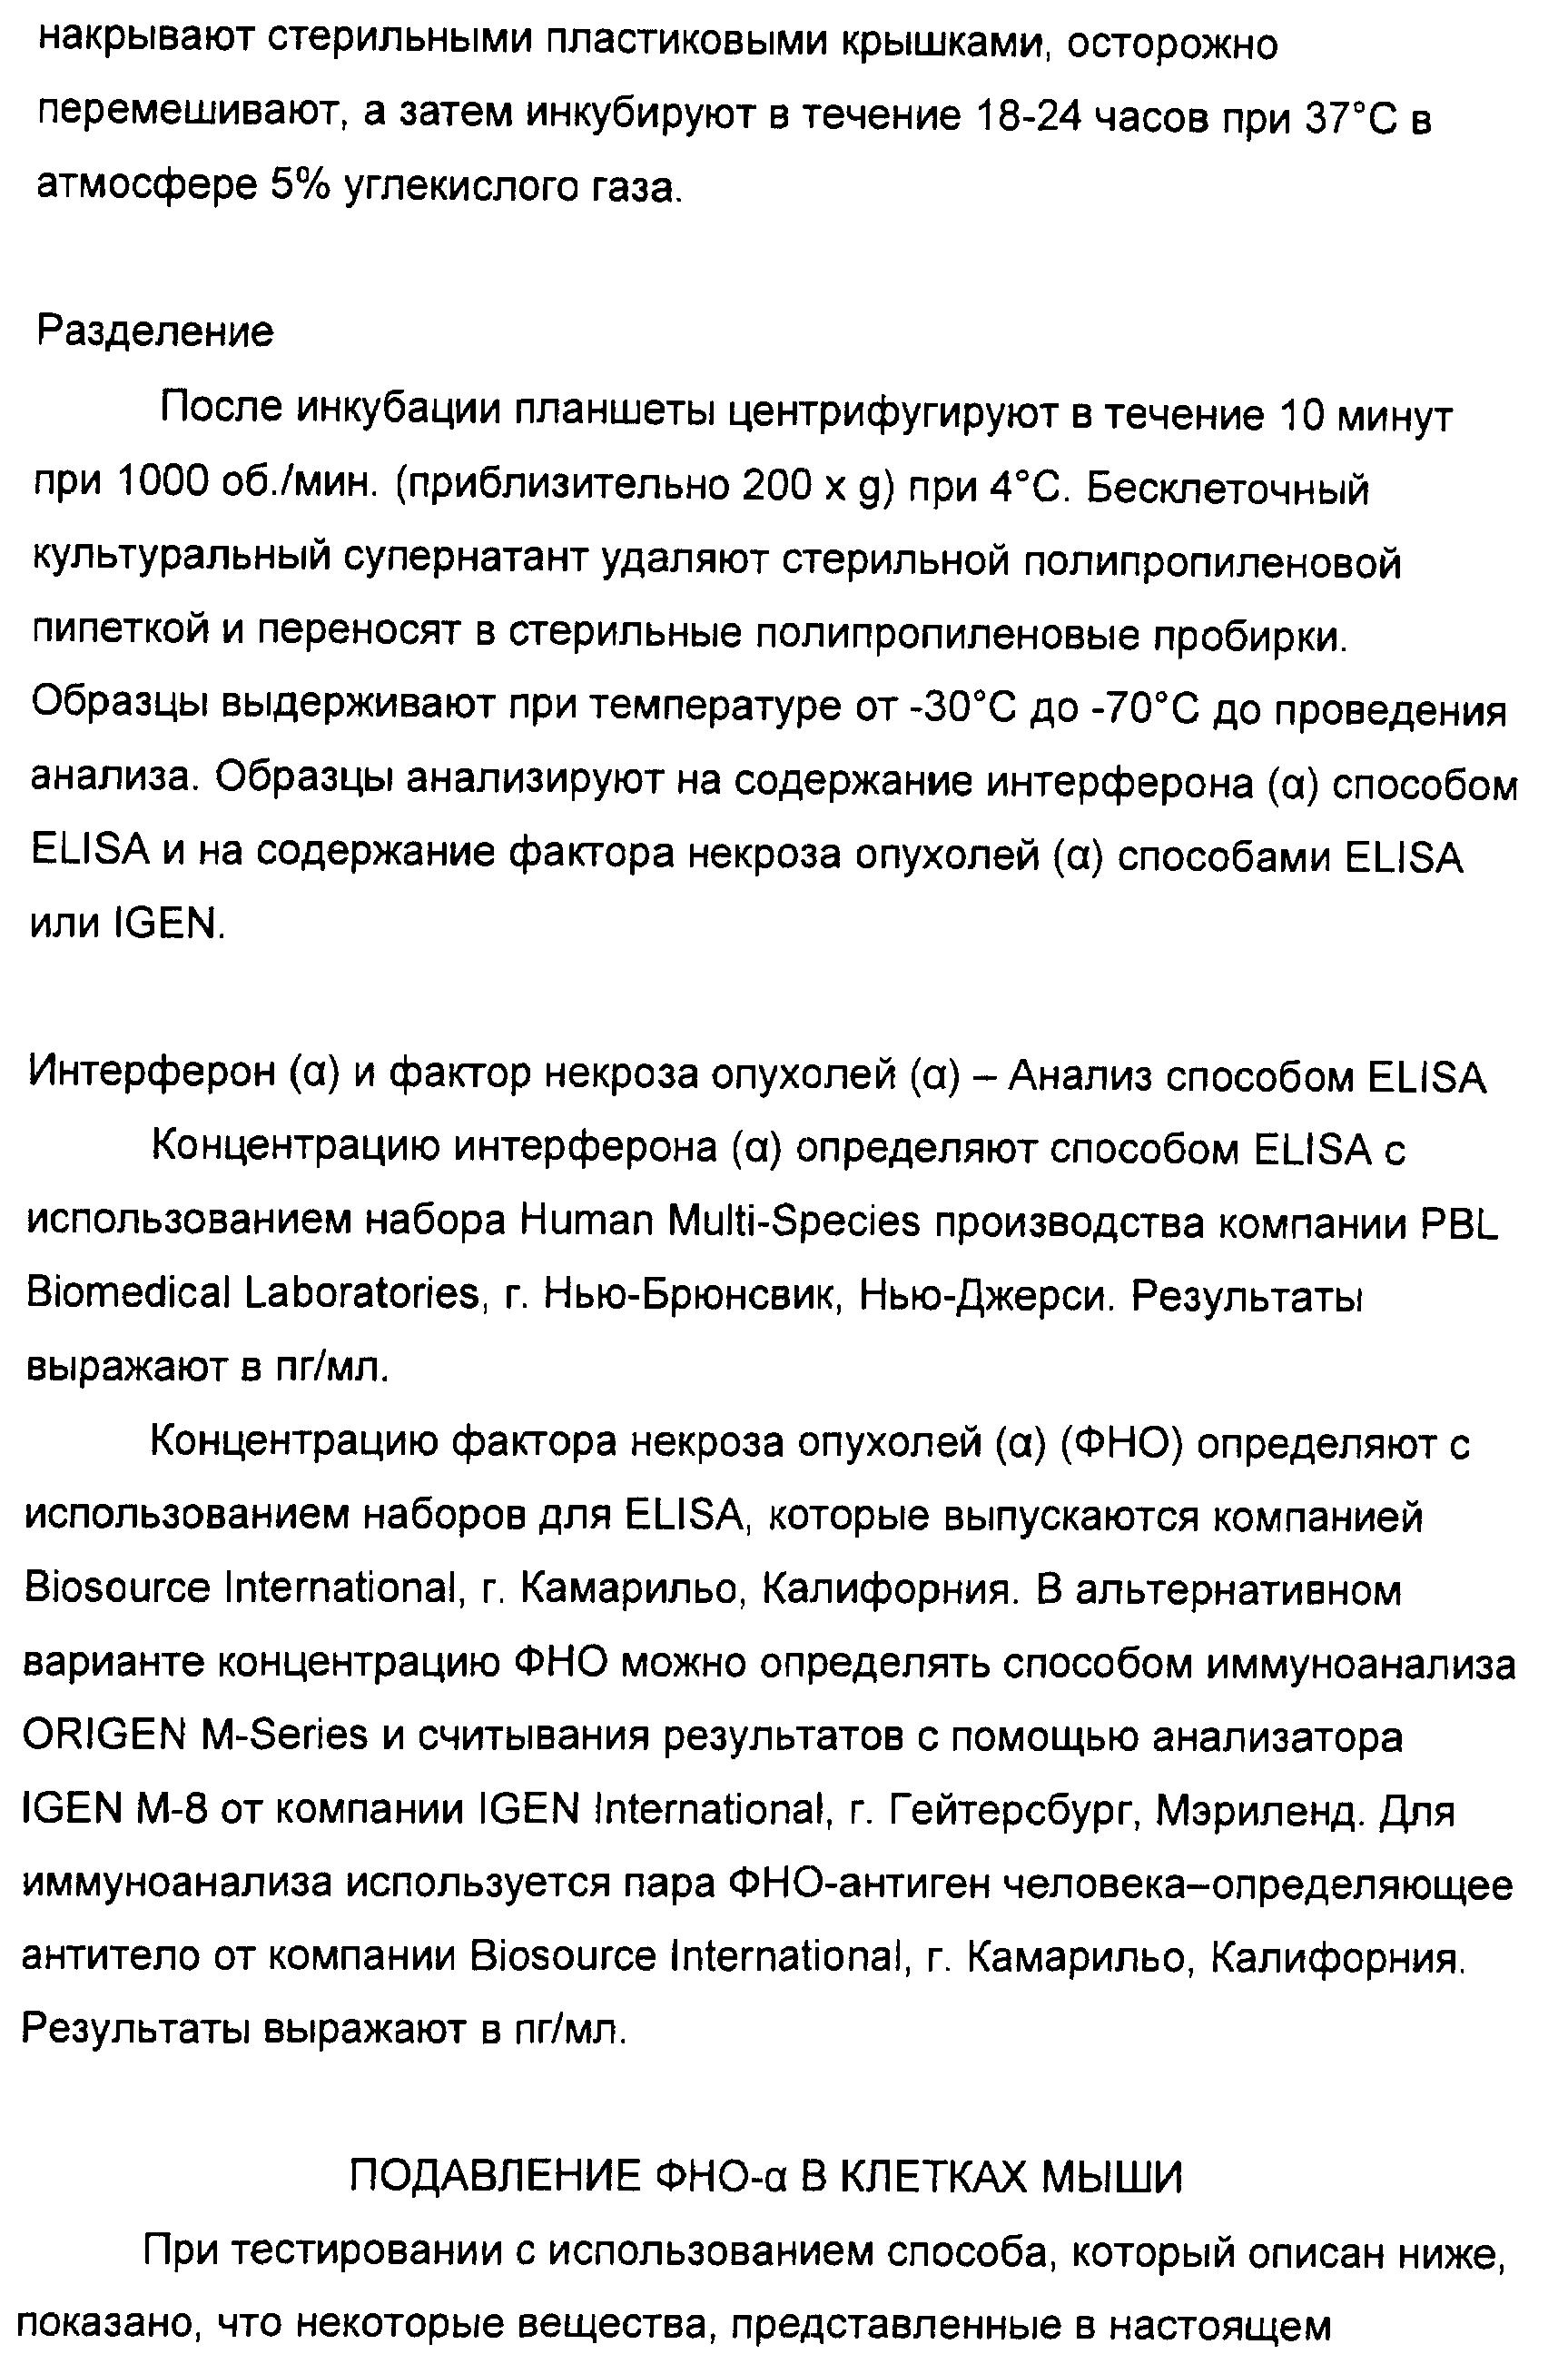 Figure 00000379